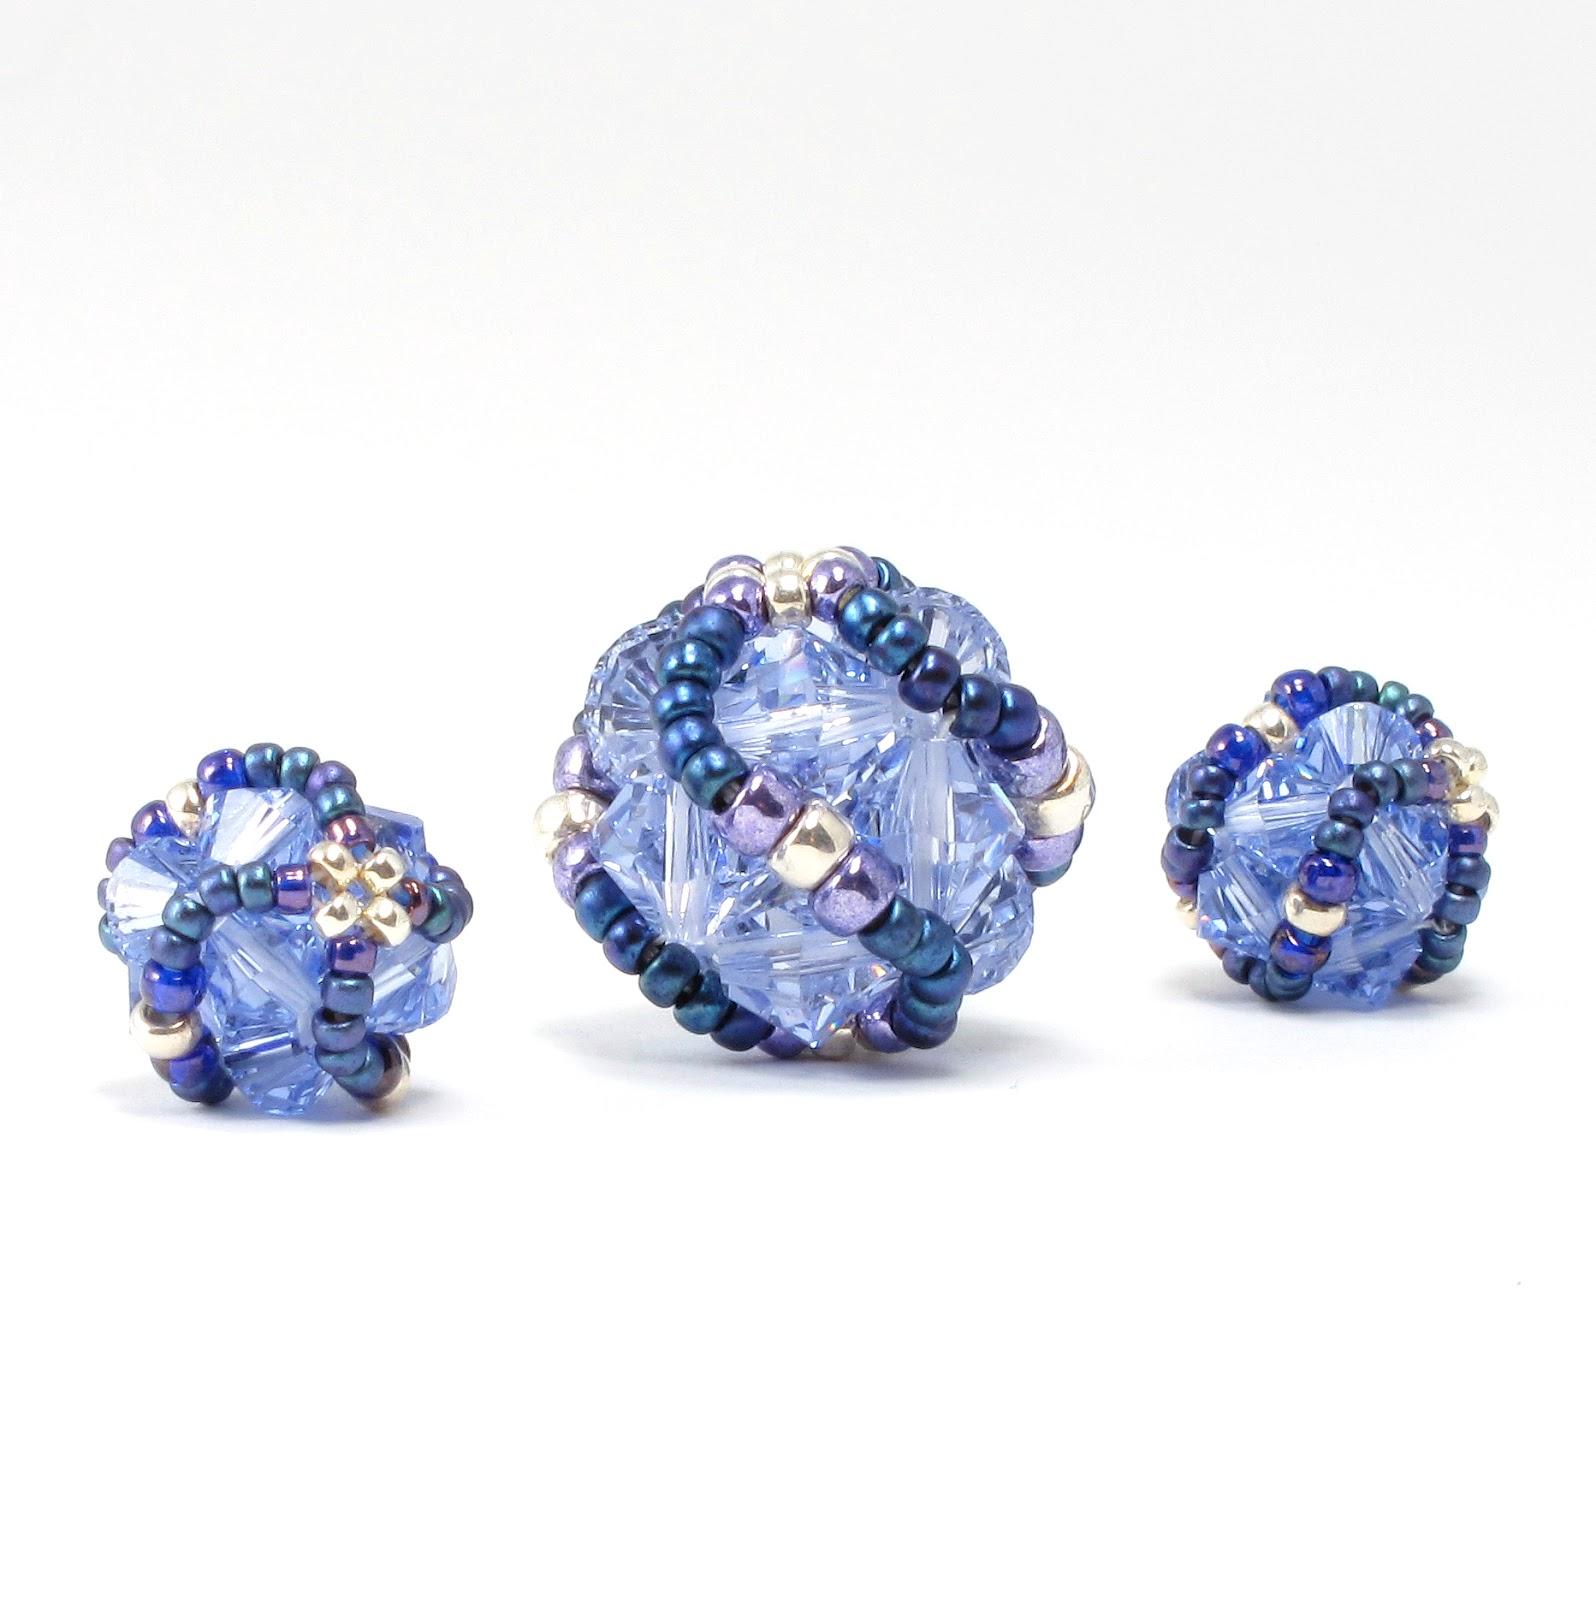 Crystal Bead Beads: Bead Origami: New Pattern: Crystal Helix Beaded Bead